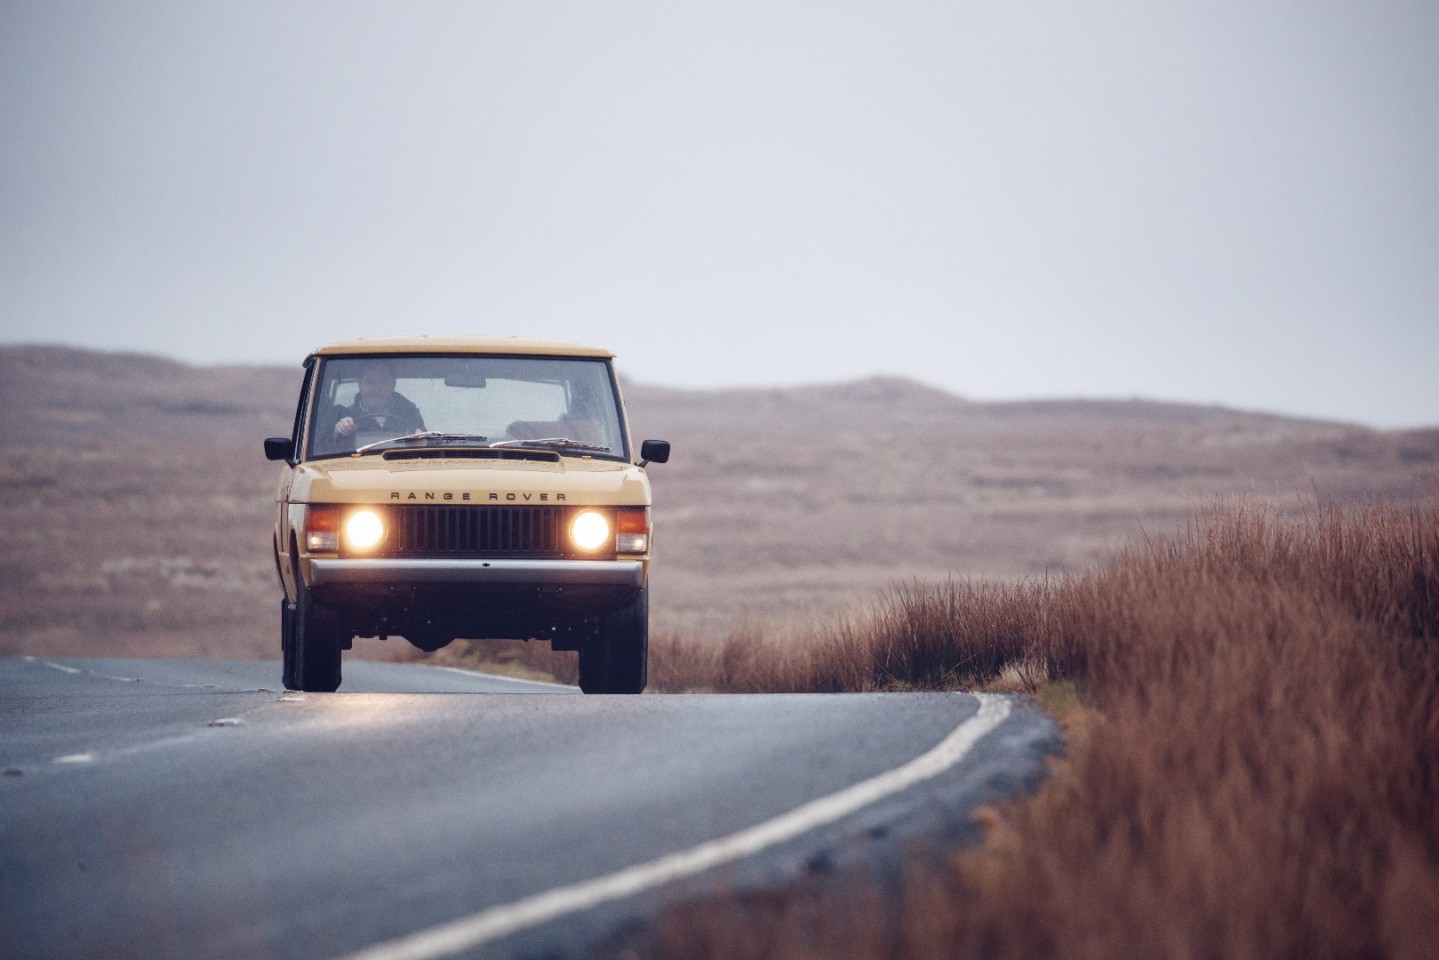 Land Rover Classic will present this Range Rover Reborn at Salon Retromobile next week